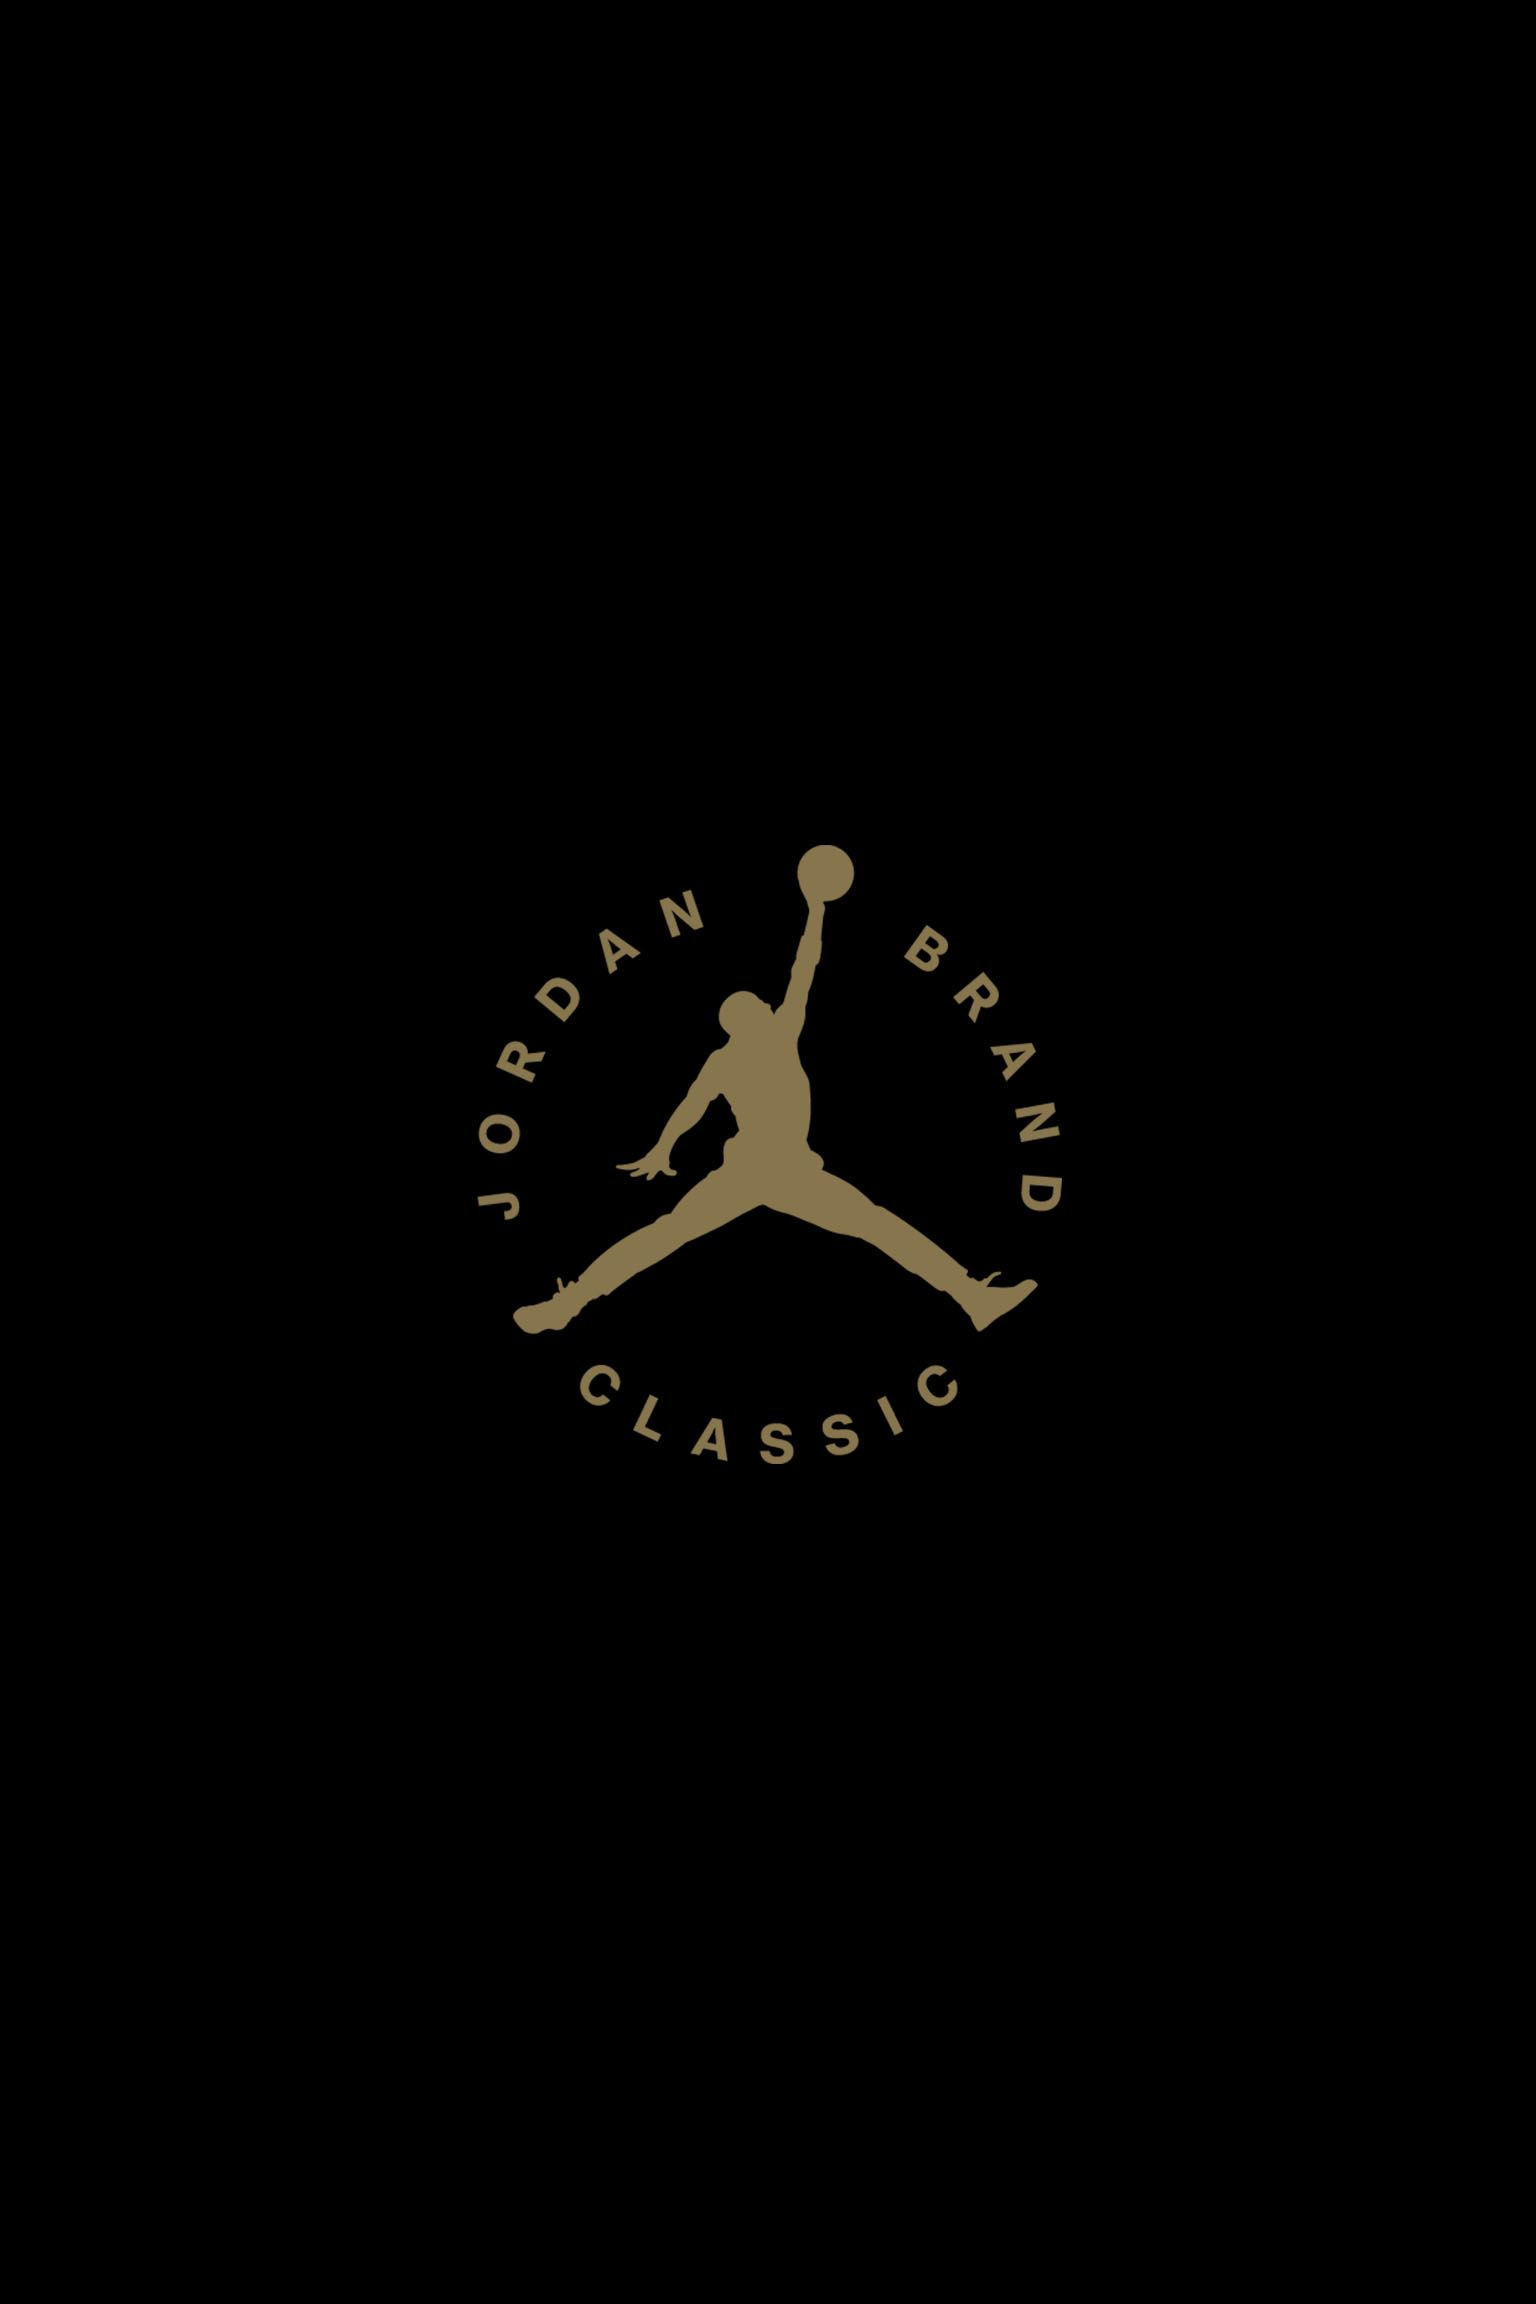 2016 Jordan Brand Classic Collection